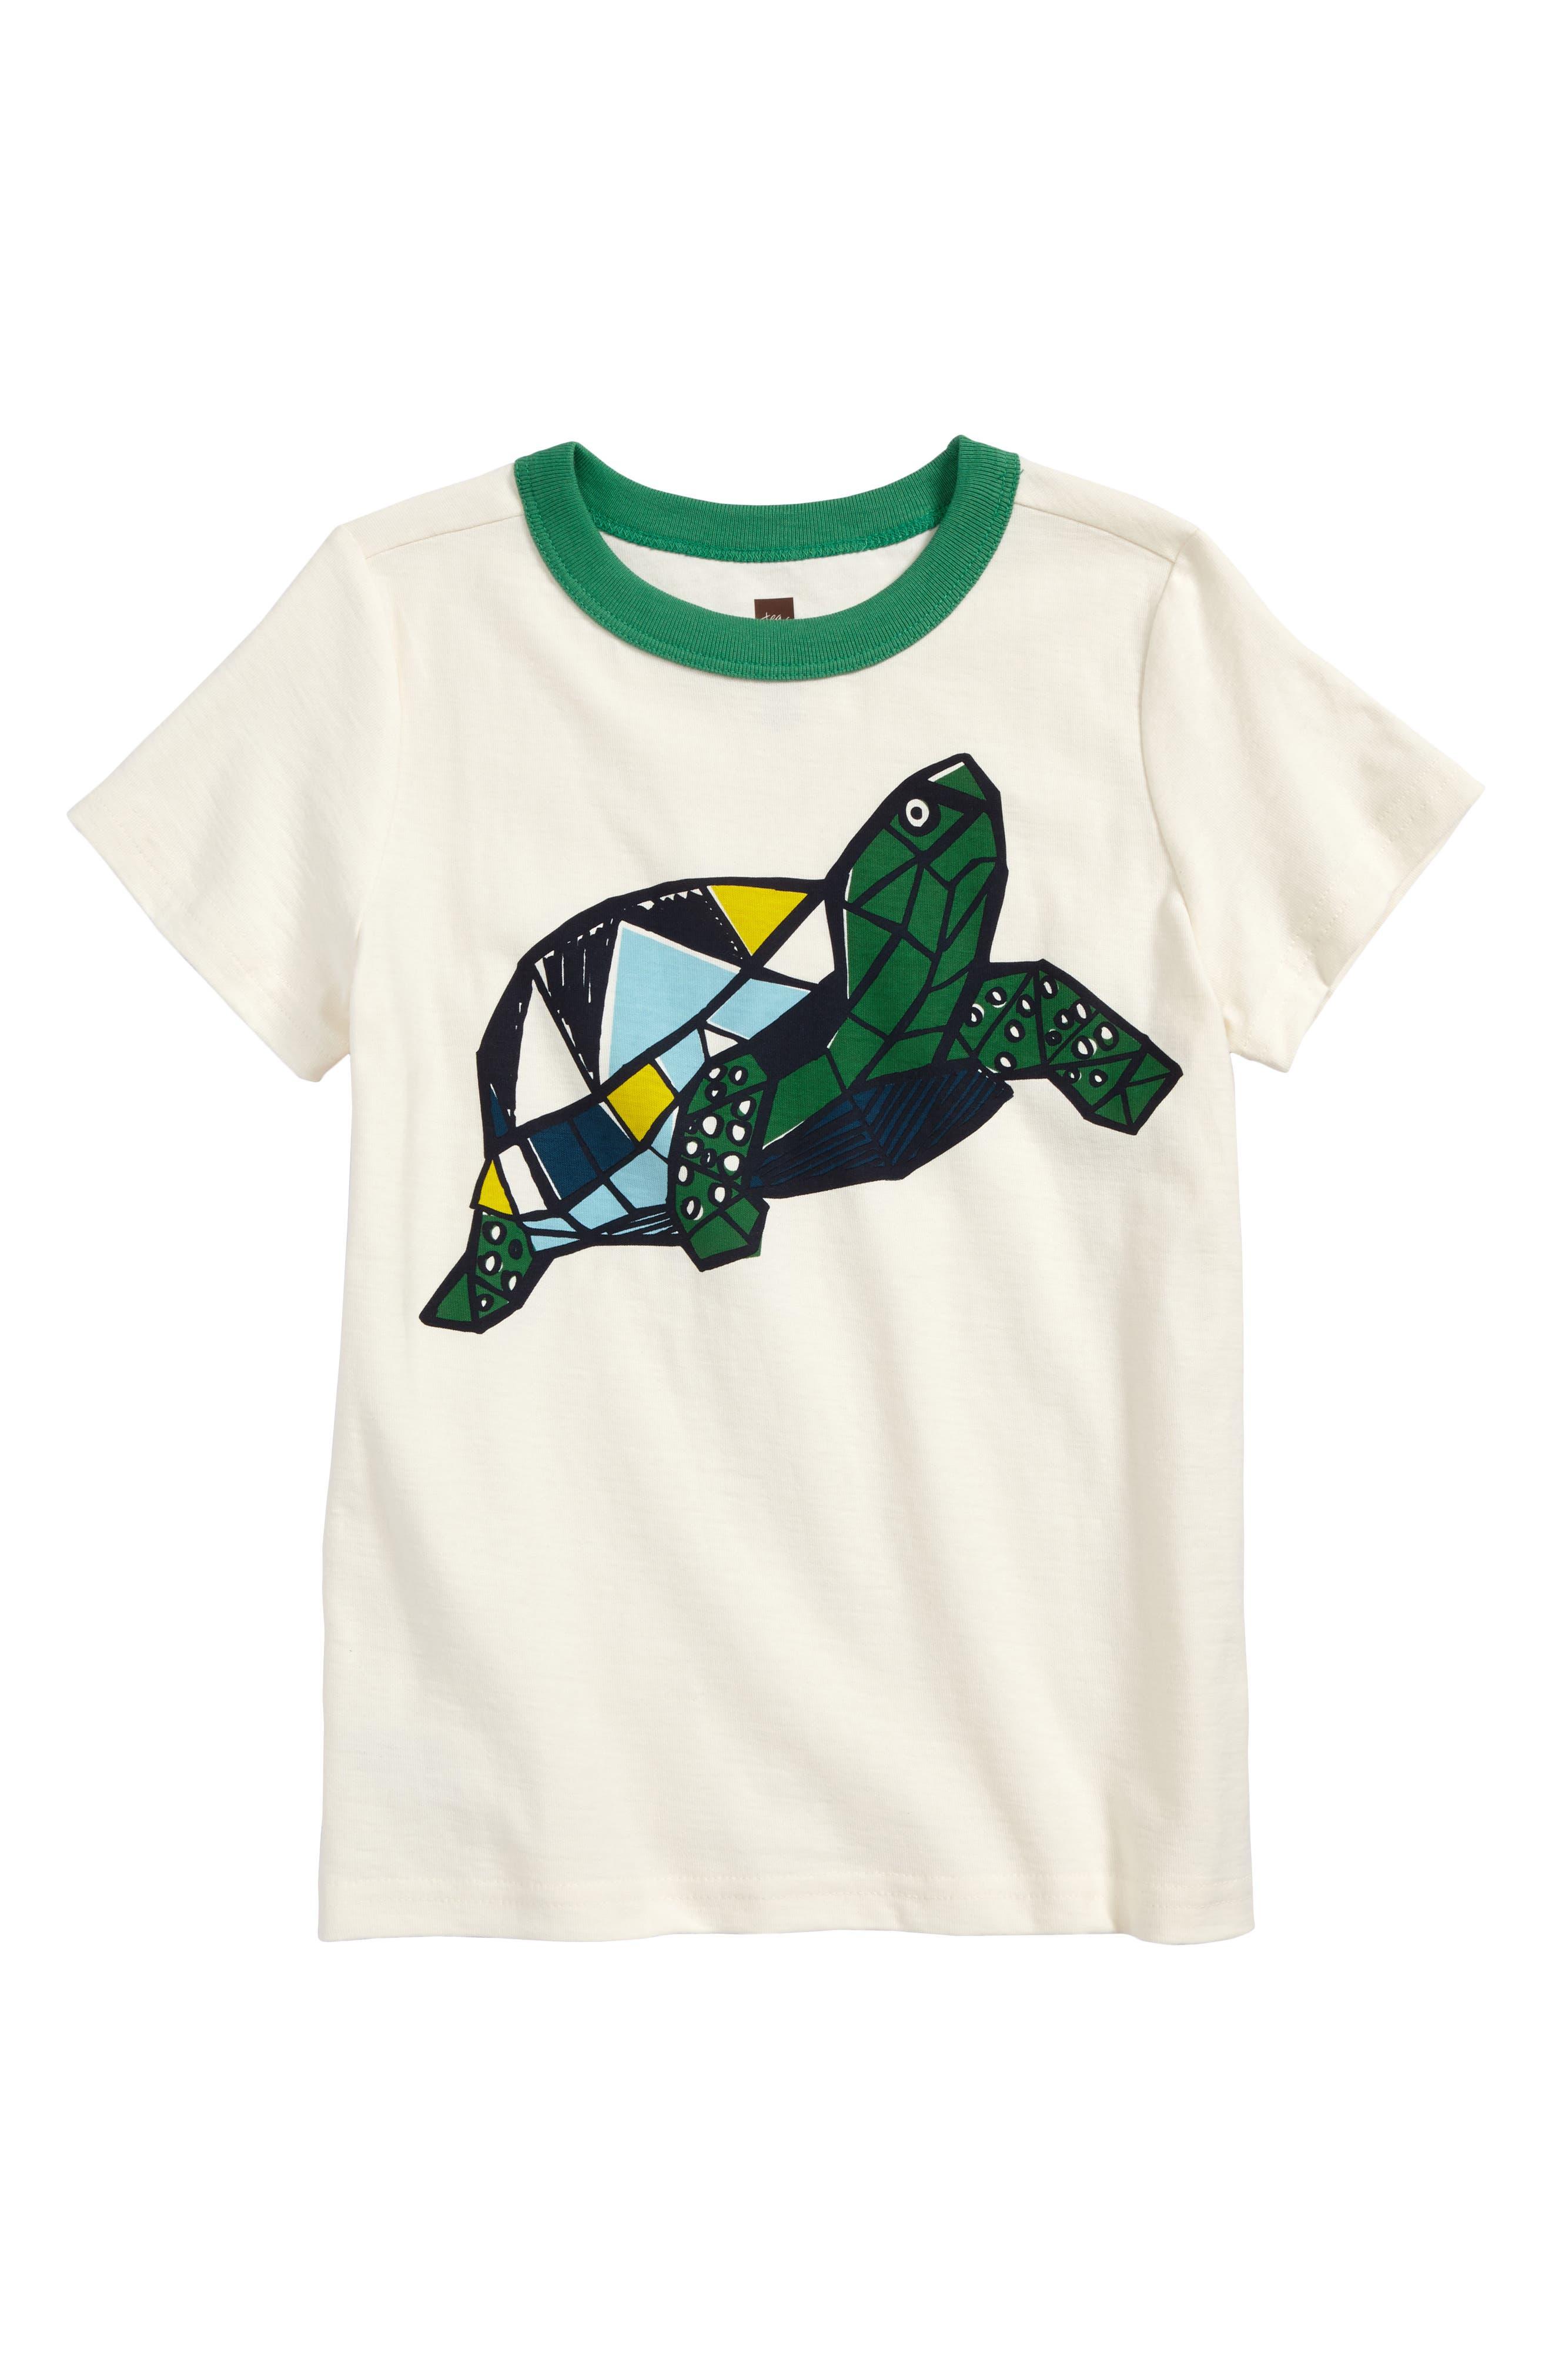 Turtle Power T-Shirt,                             Main thumbnail 1, color,